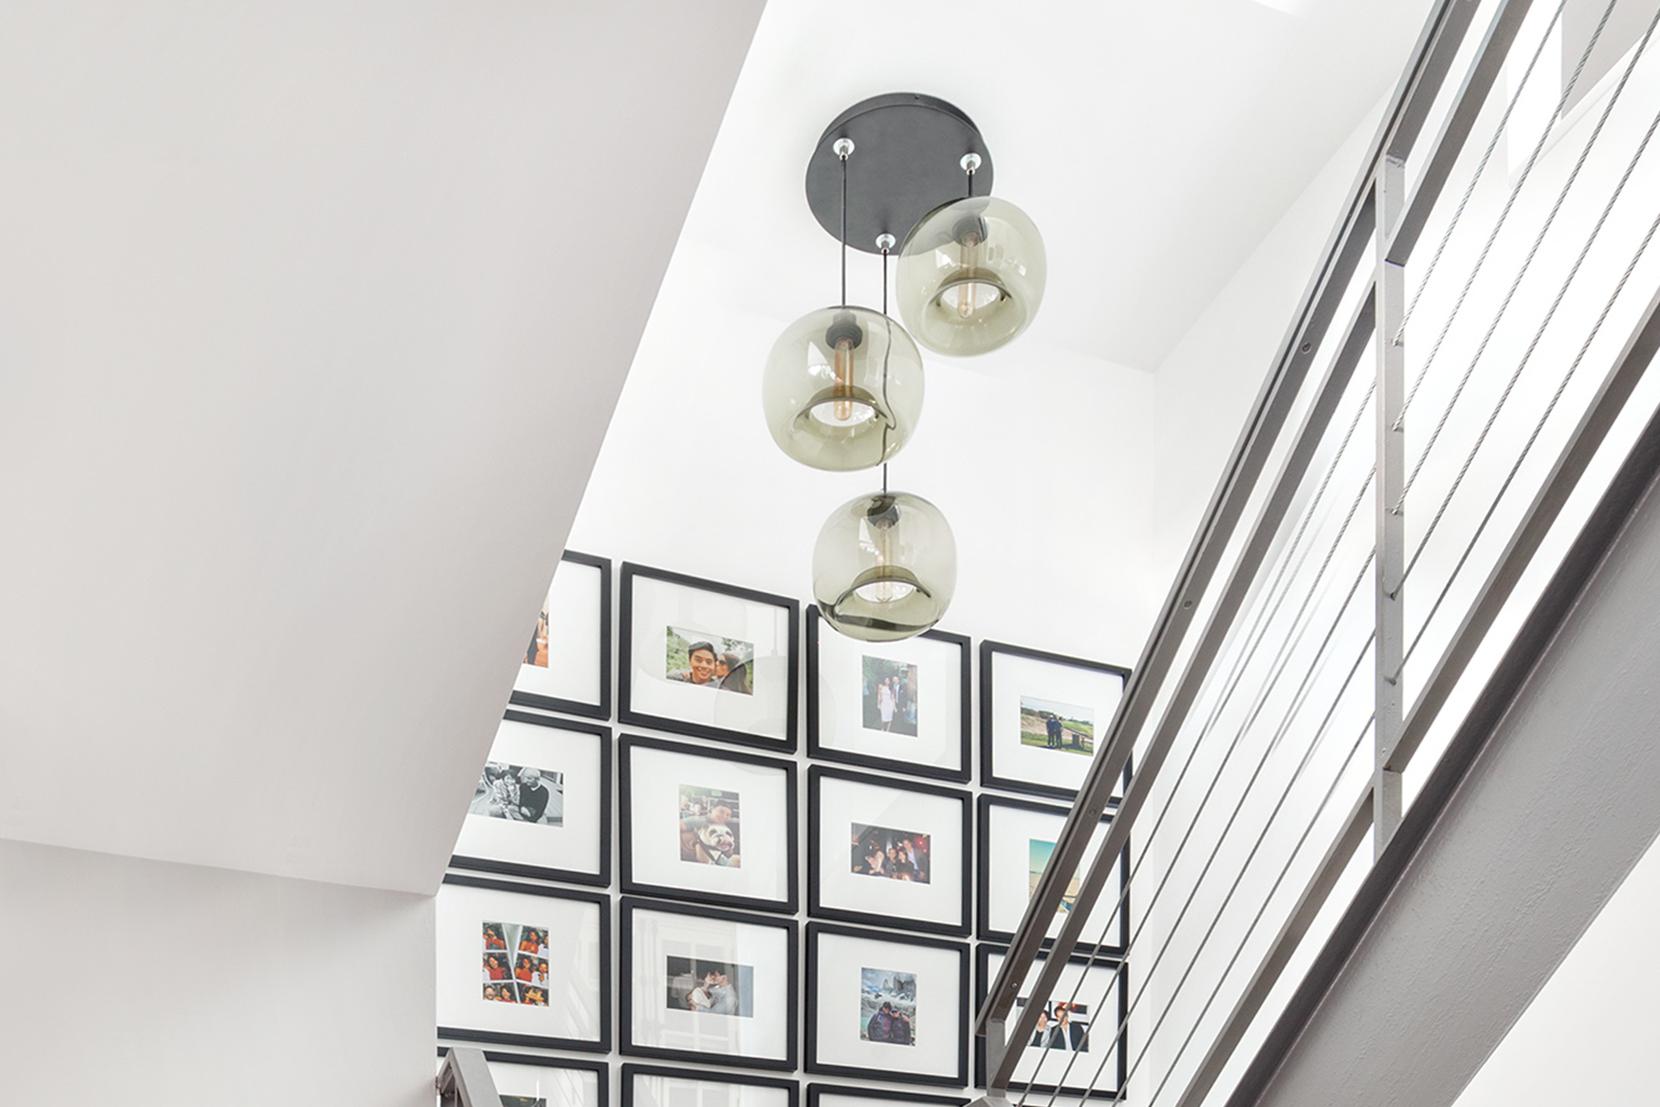 Modern Glass Entry Way Lighting - Smoke Encalmo Stamen Pendant Lights